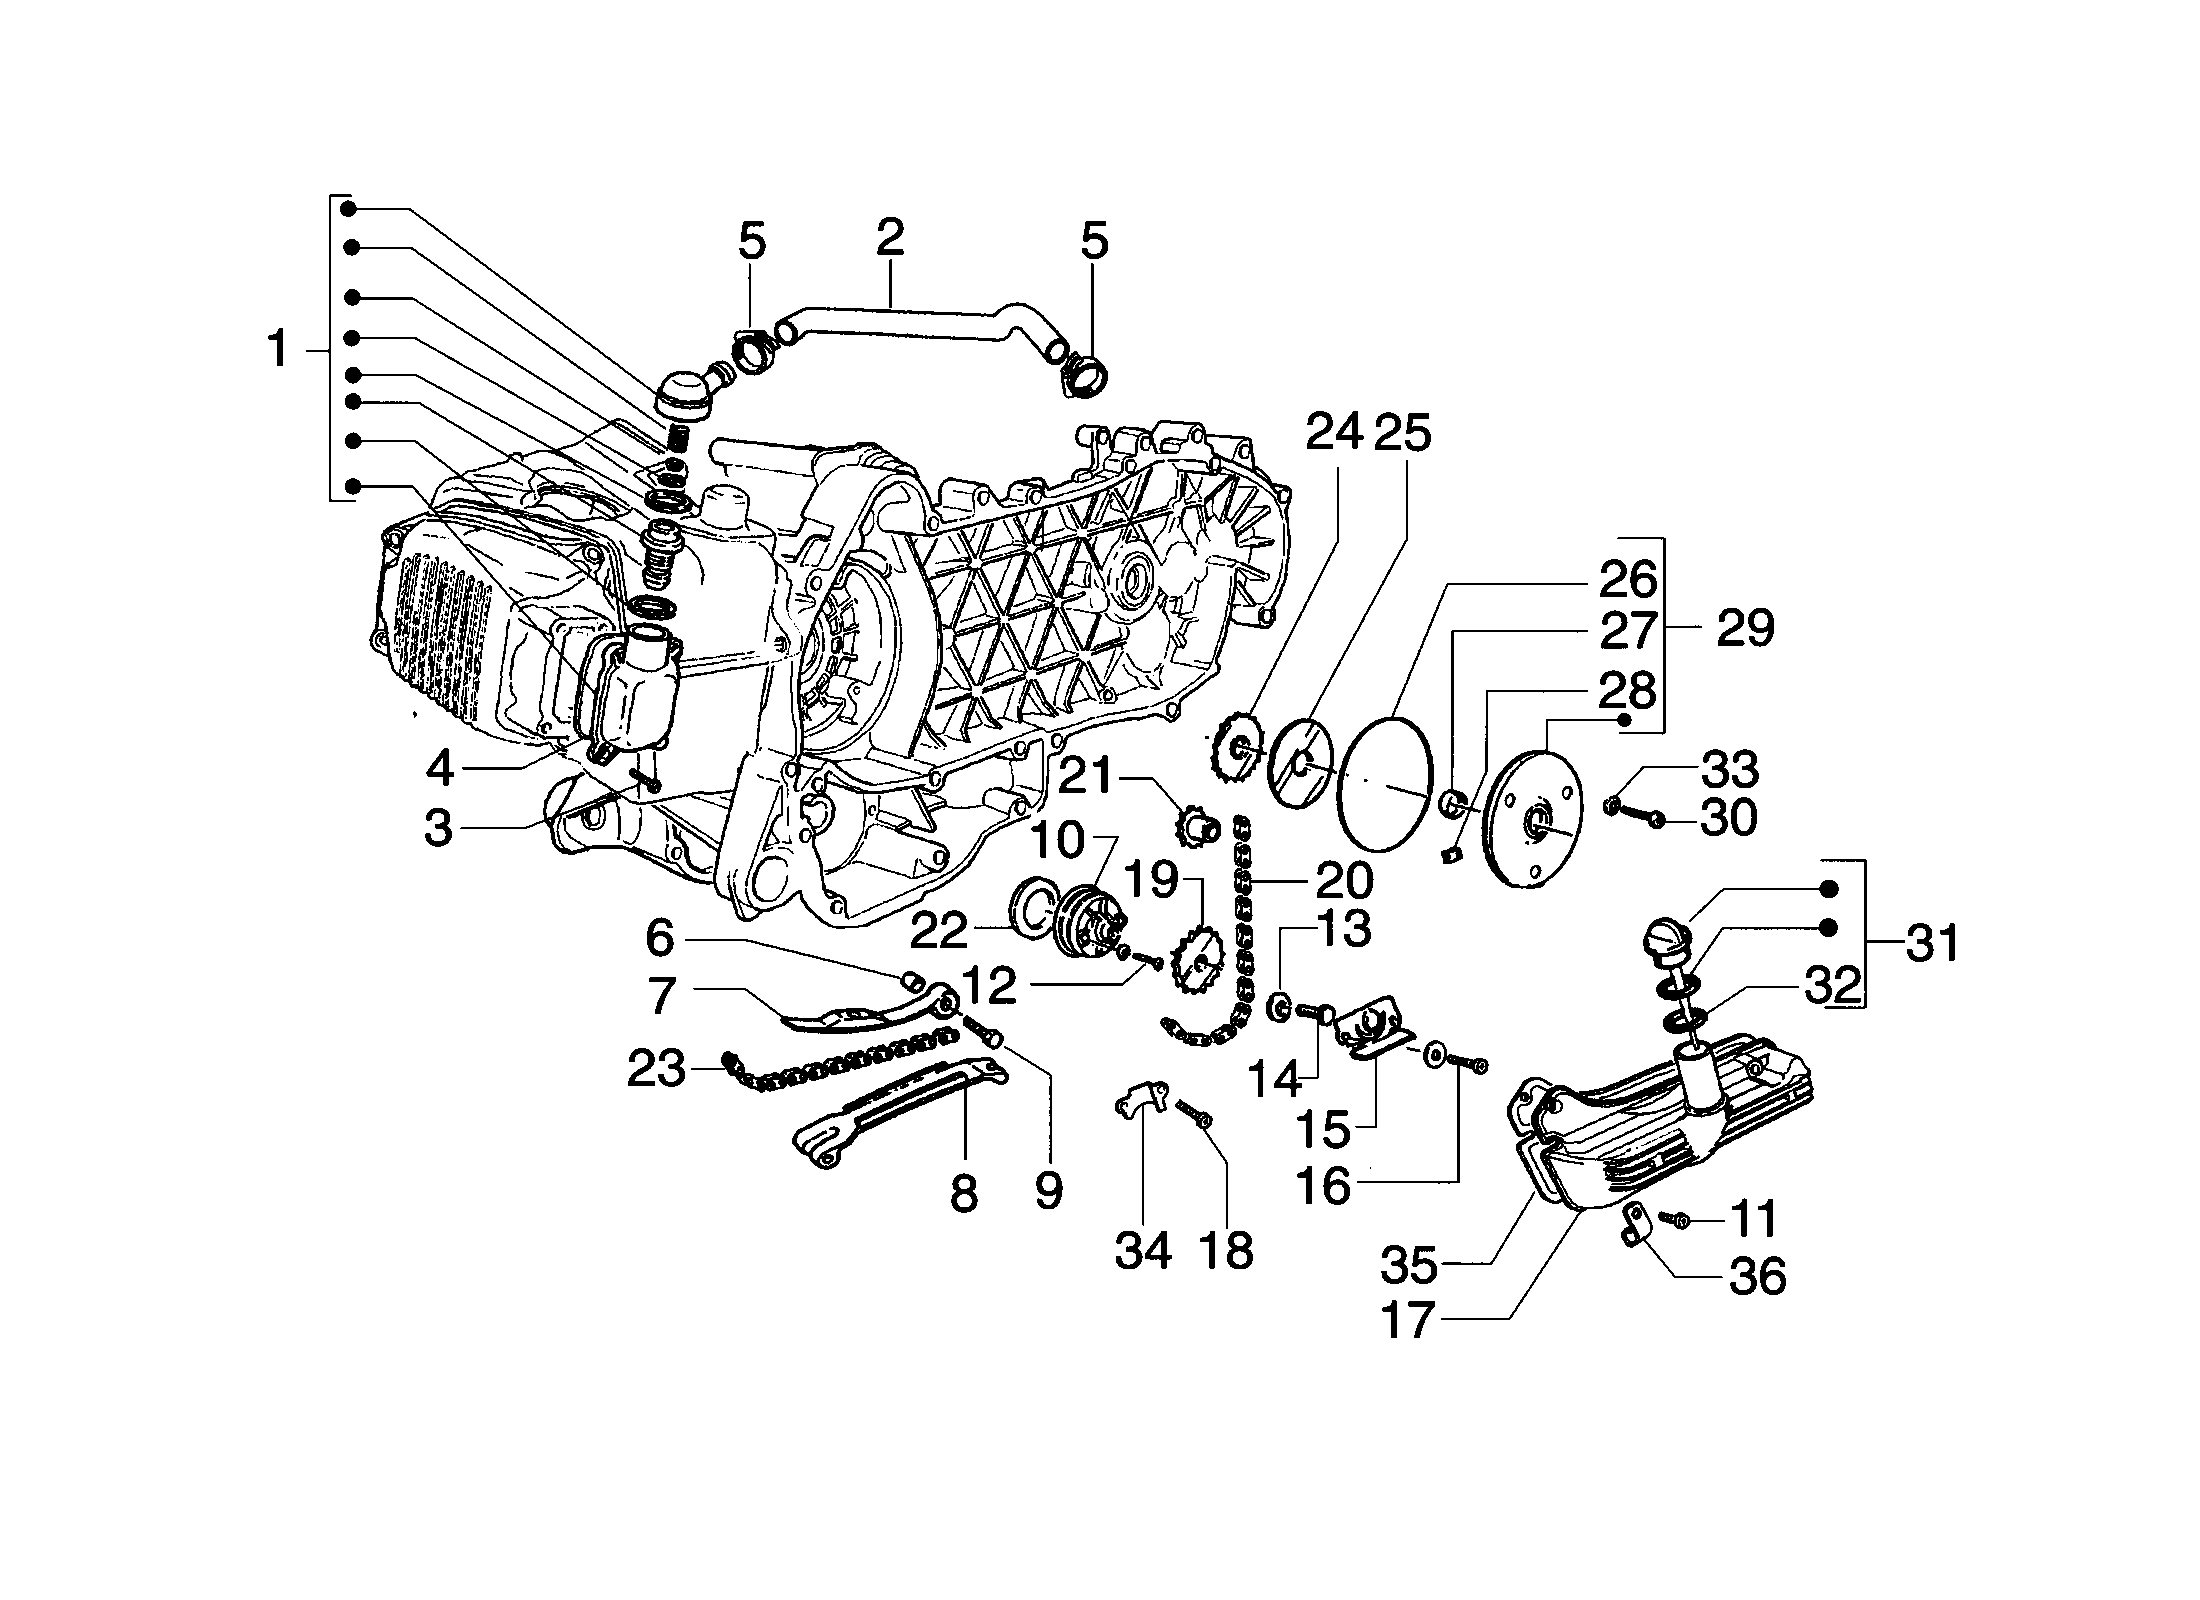 Ölpumpe/Antrieb/Entlüftung